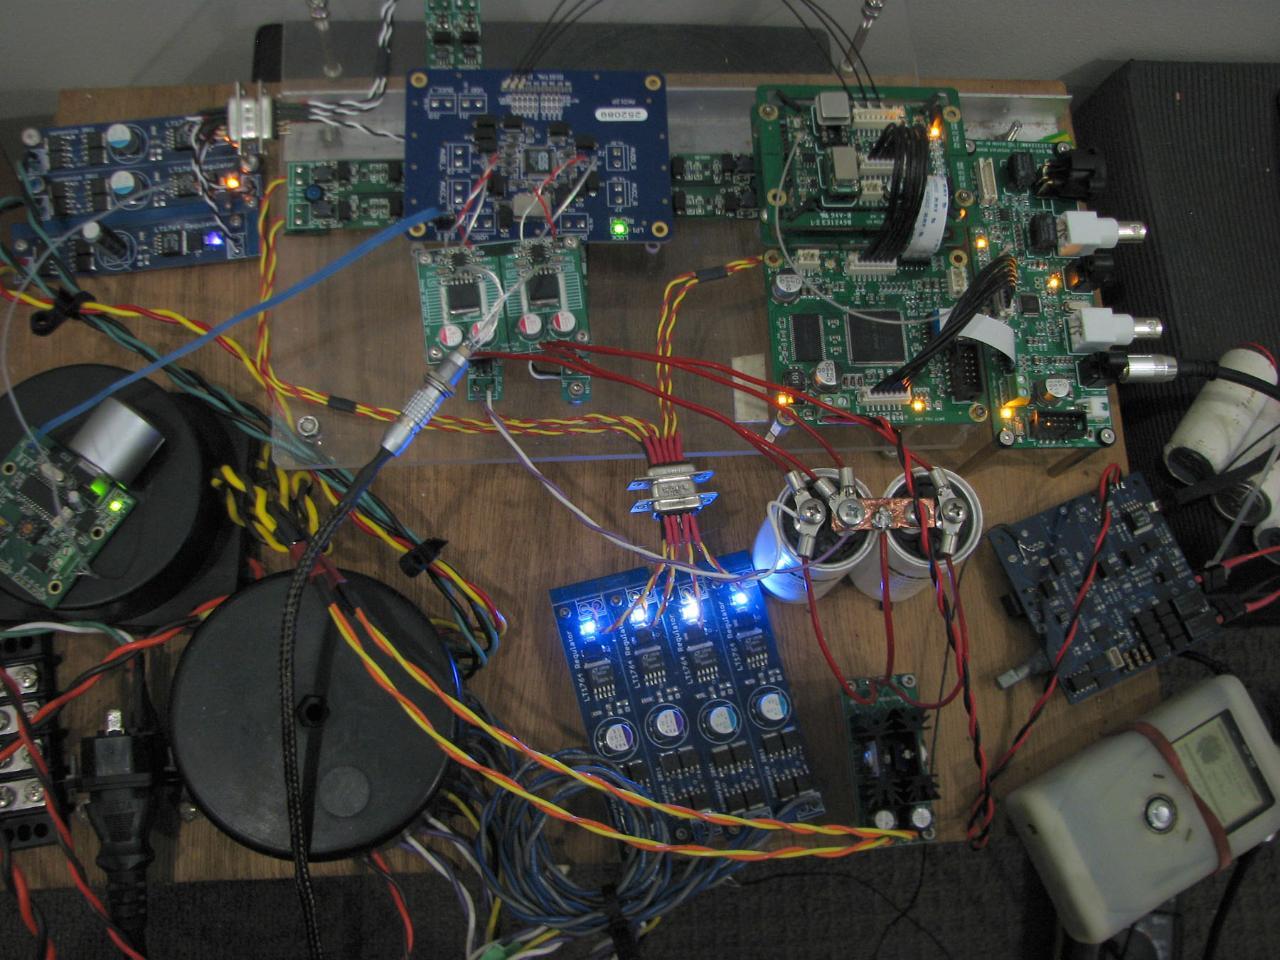 fifo-akd12p testing lock 09May2012_0936.jpg